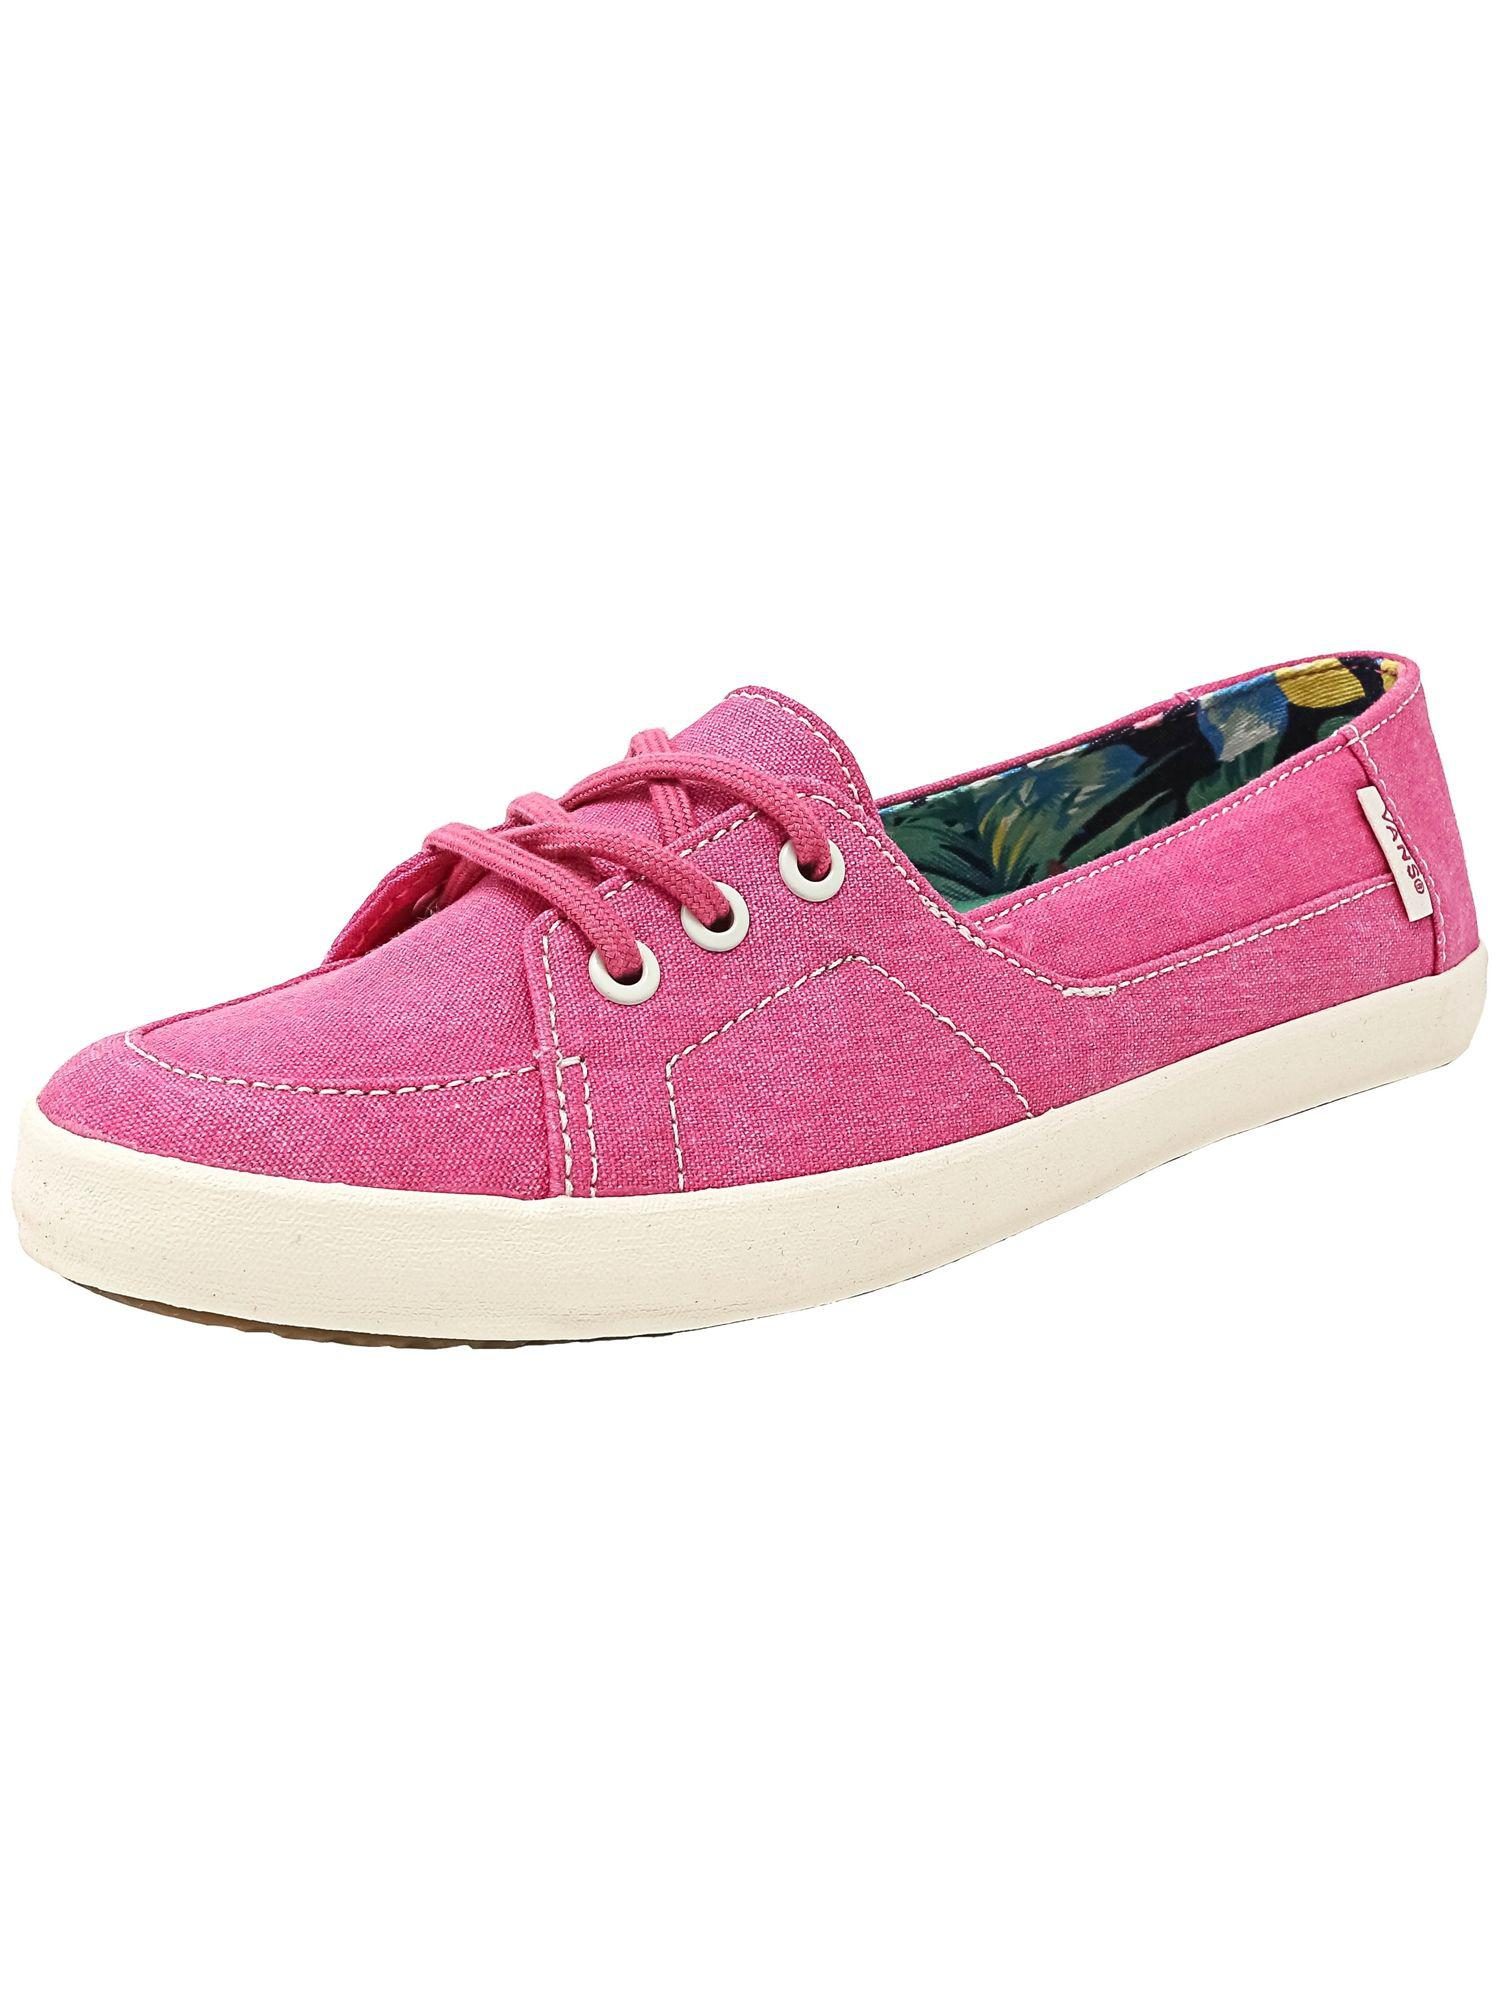 b86f0c9d75 Vans Women s Palisades Vulc Washed Canvas Fuchsia Purple Ankle-high ...